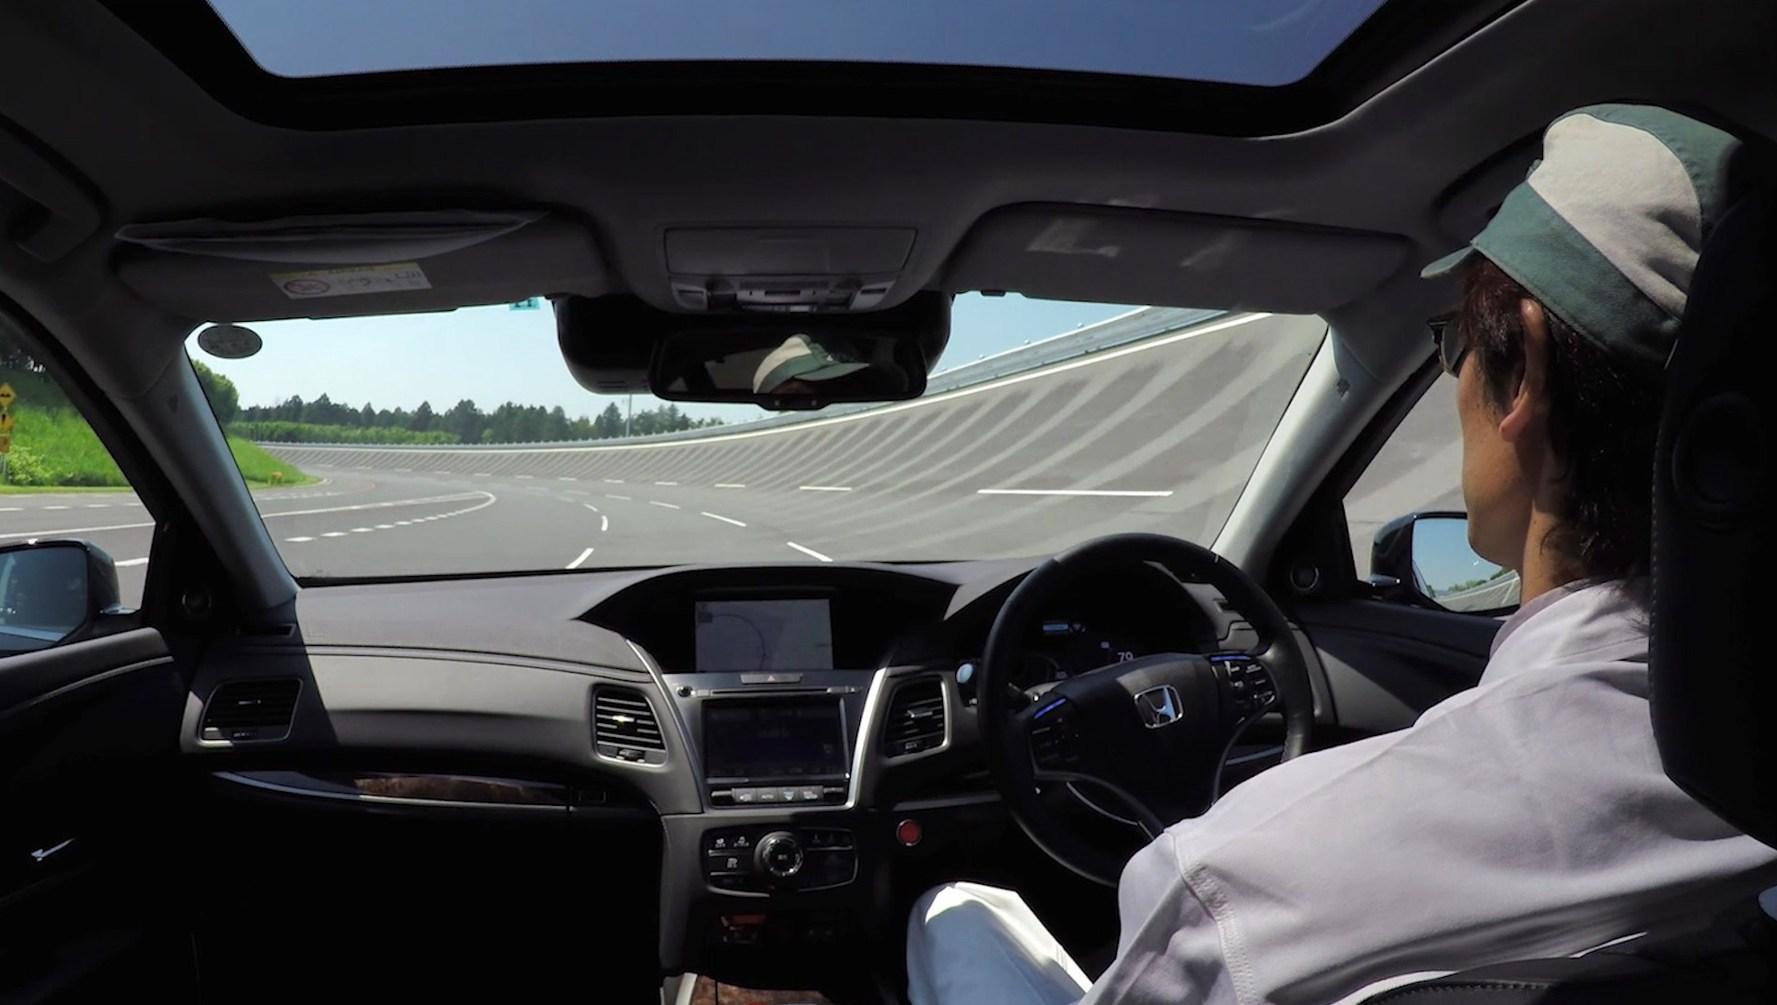 Honda tendrá coches totalmente autónomos en 2025